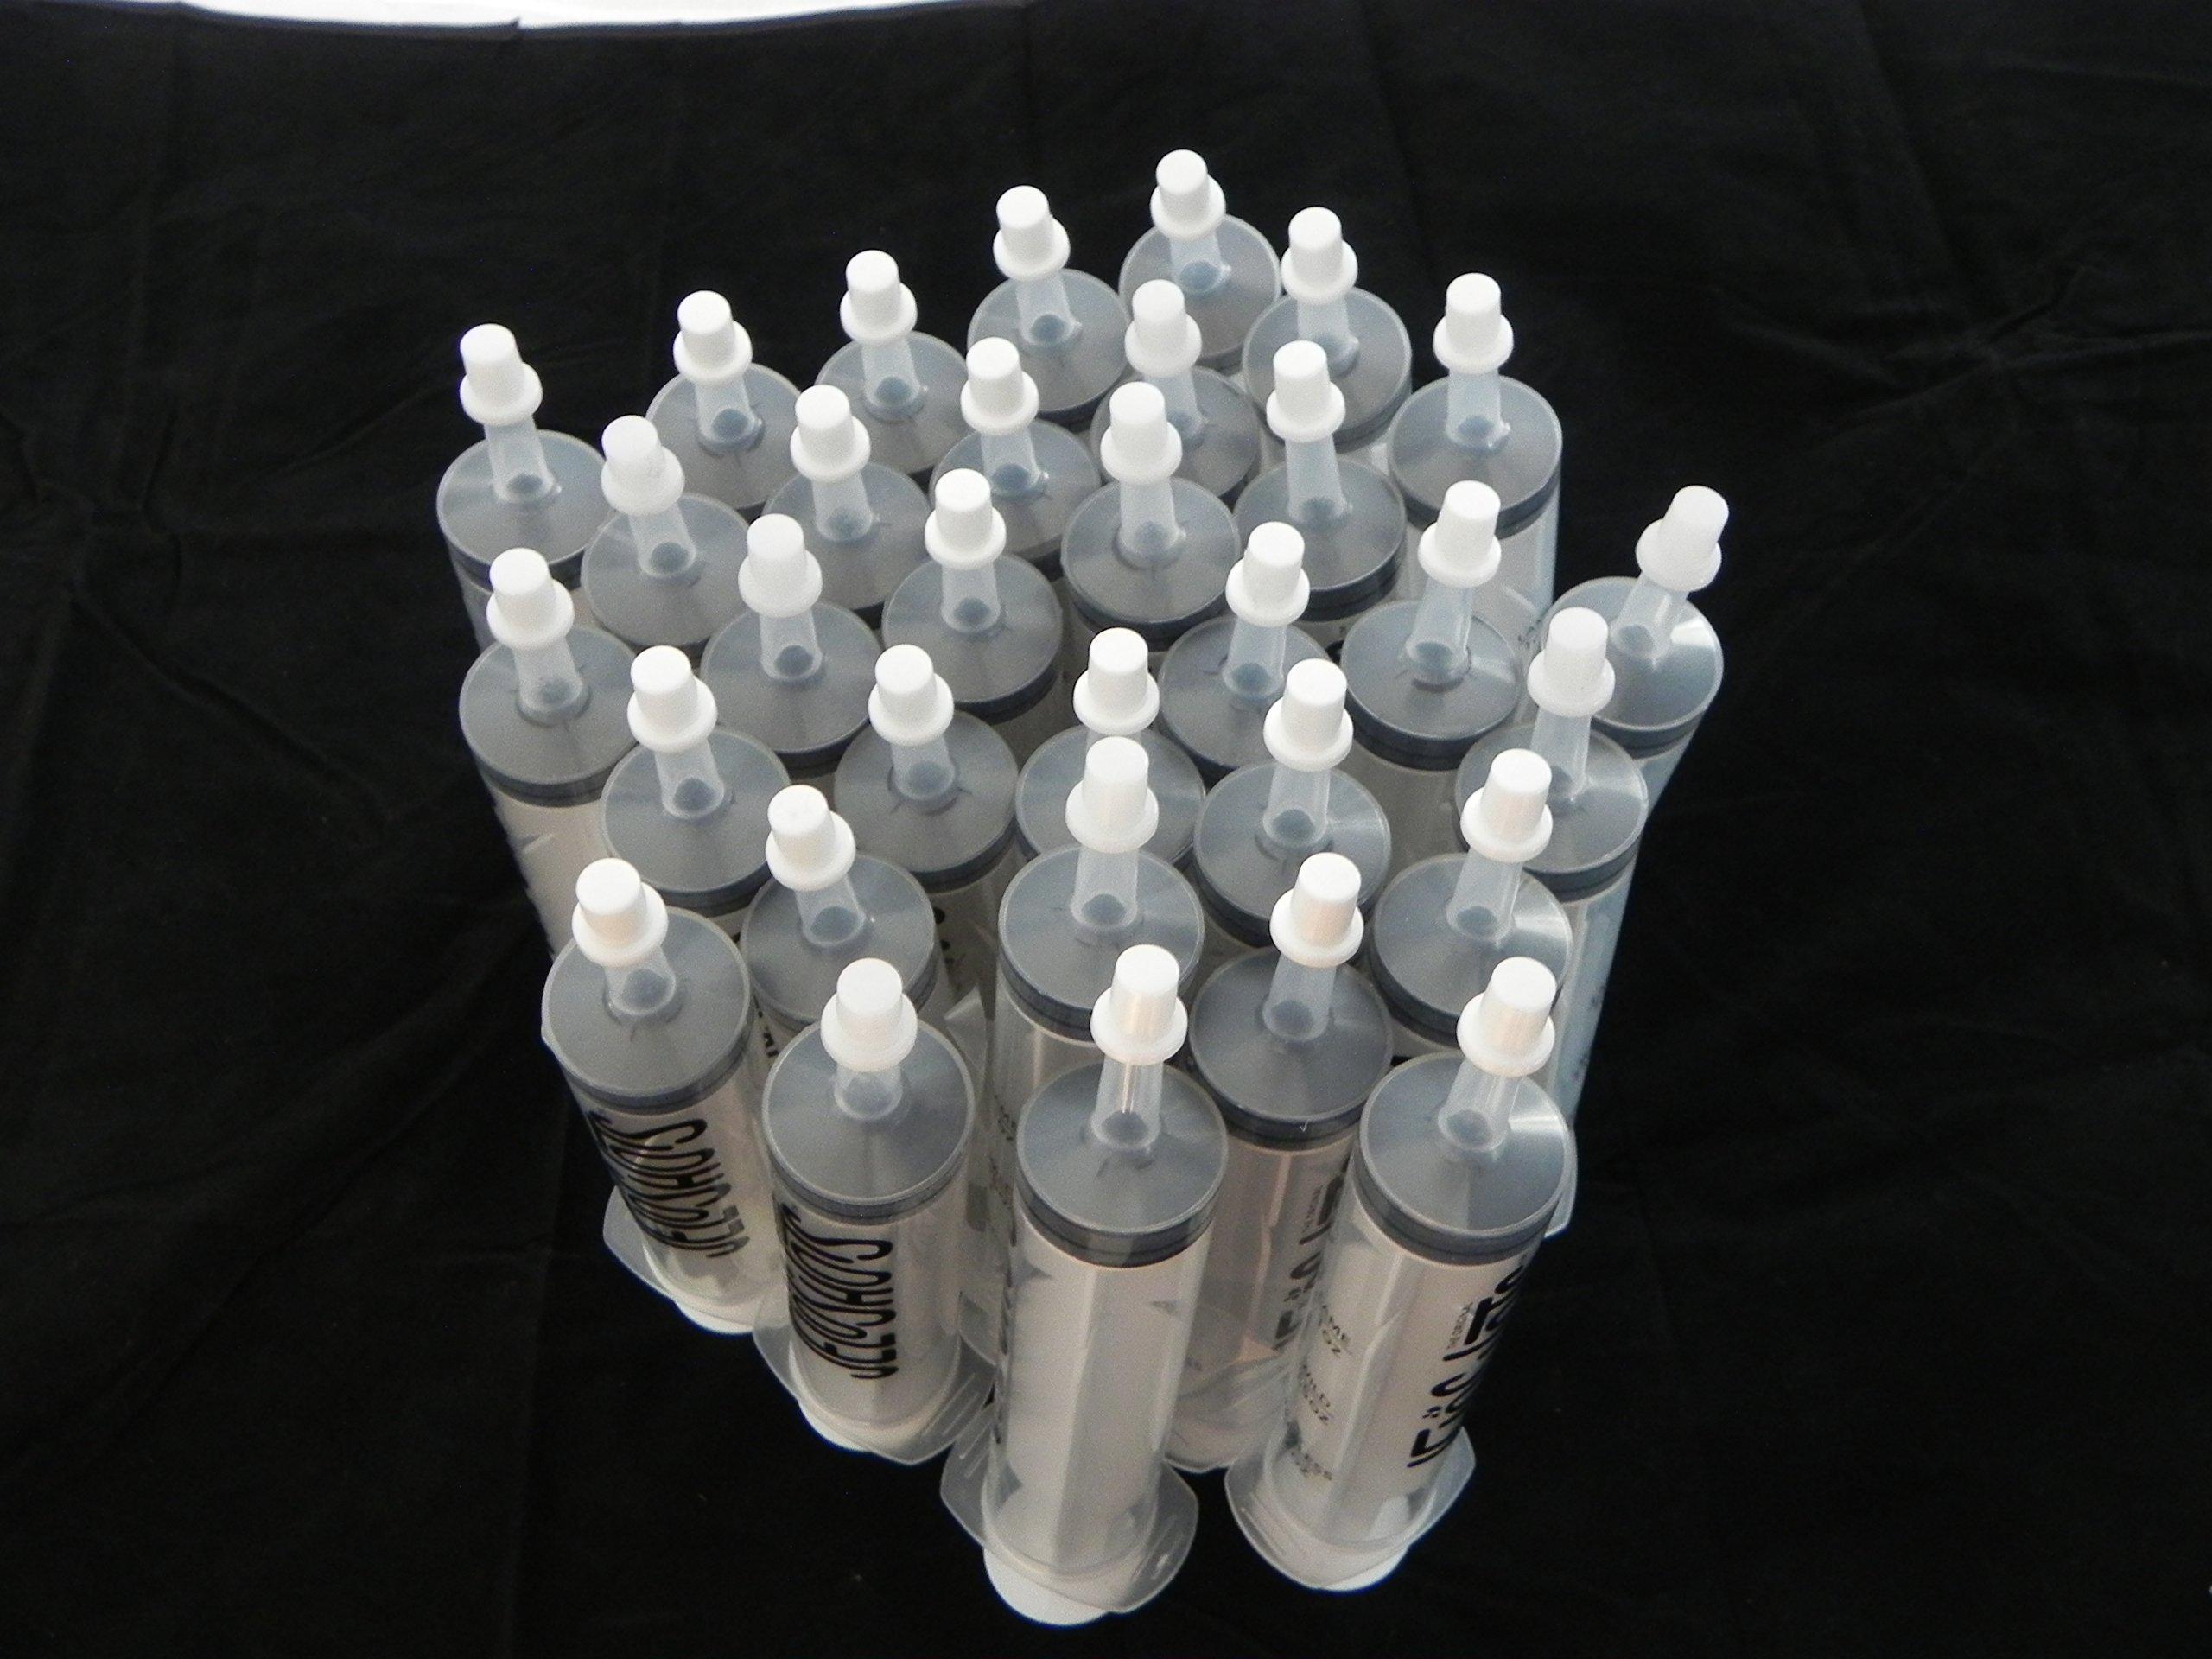 Jello Shot Syringes 32-Pack, Medium (up to 2oz), The Original JeloShots Gelatin Jello Shot Syringes with Easy-Grip Caps, Reusable by The Original JeloShots (Image #2)